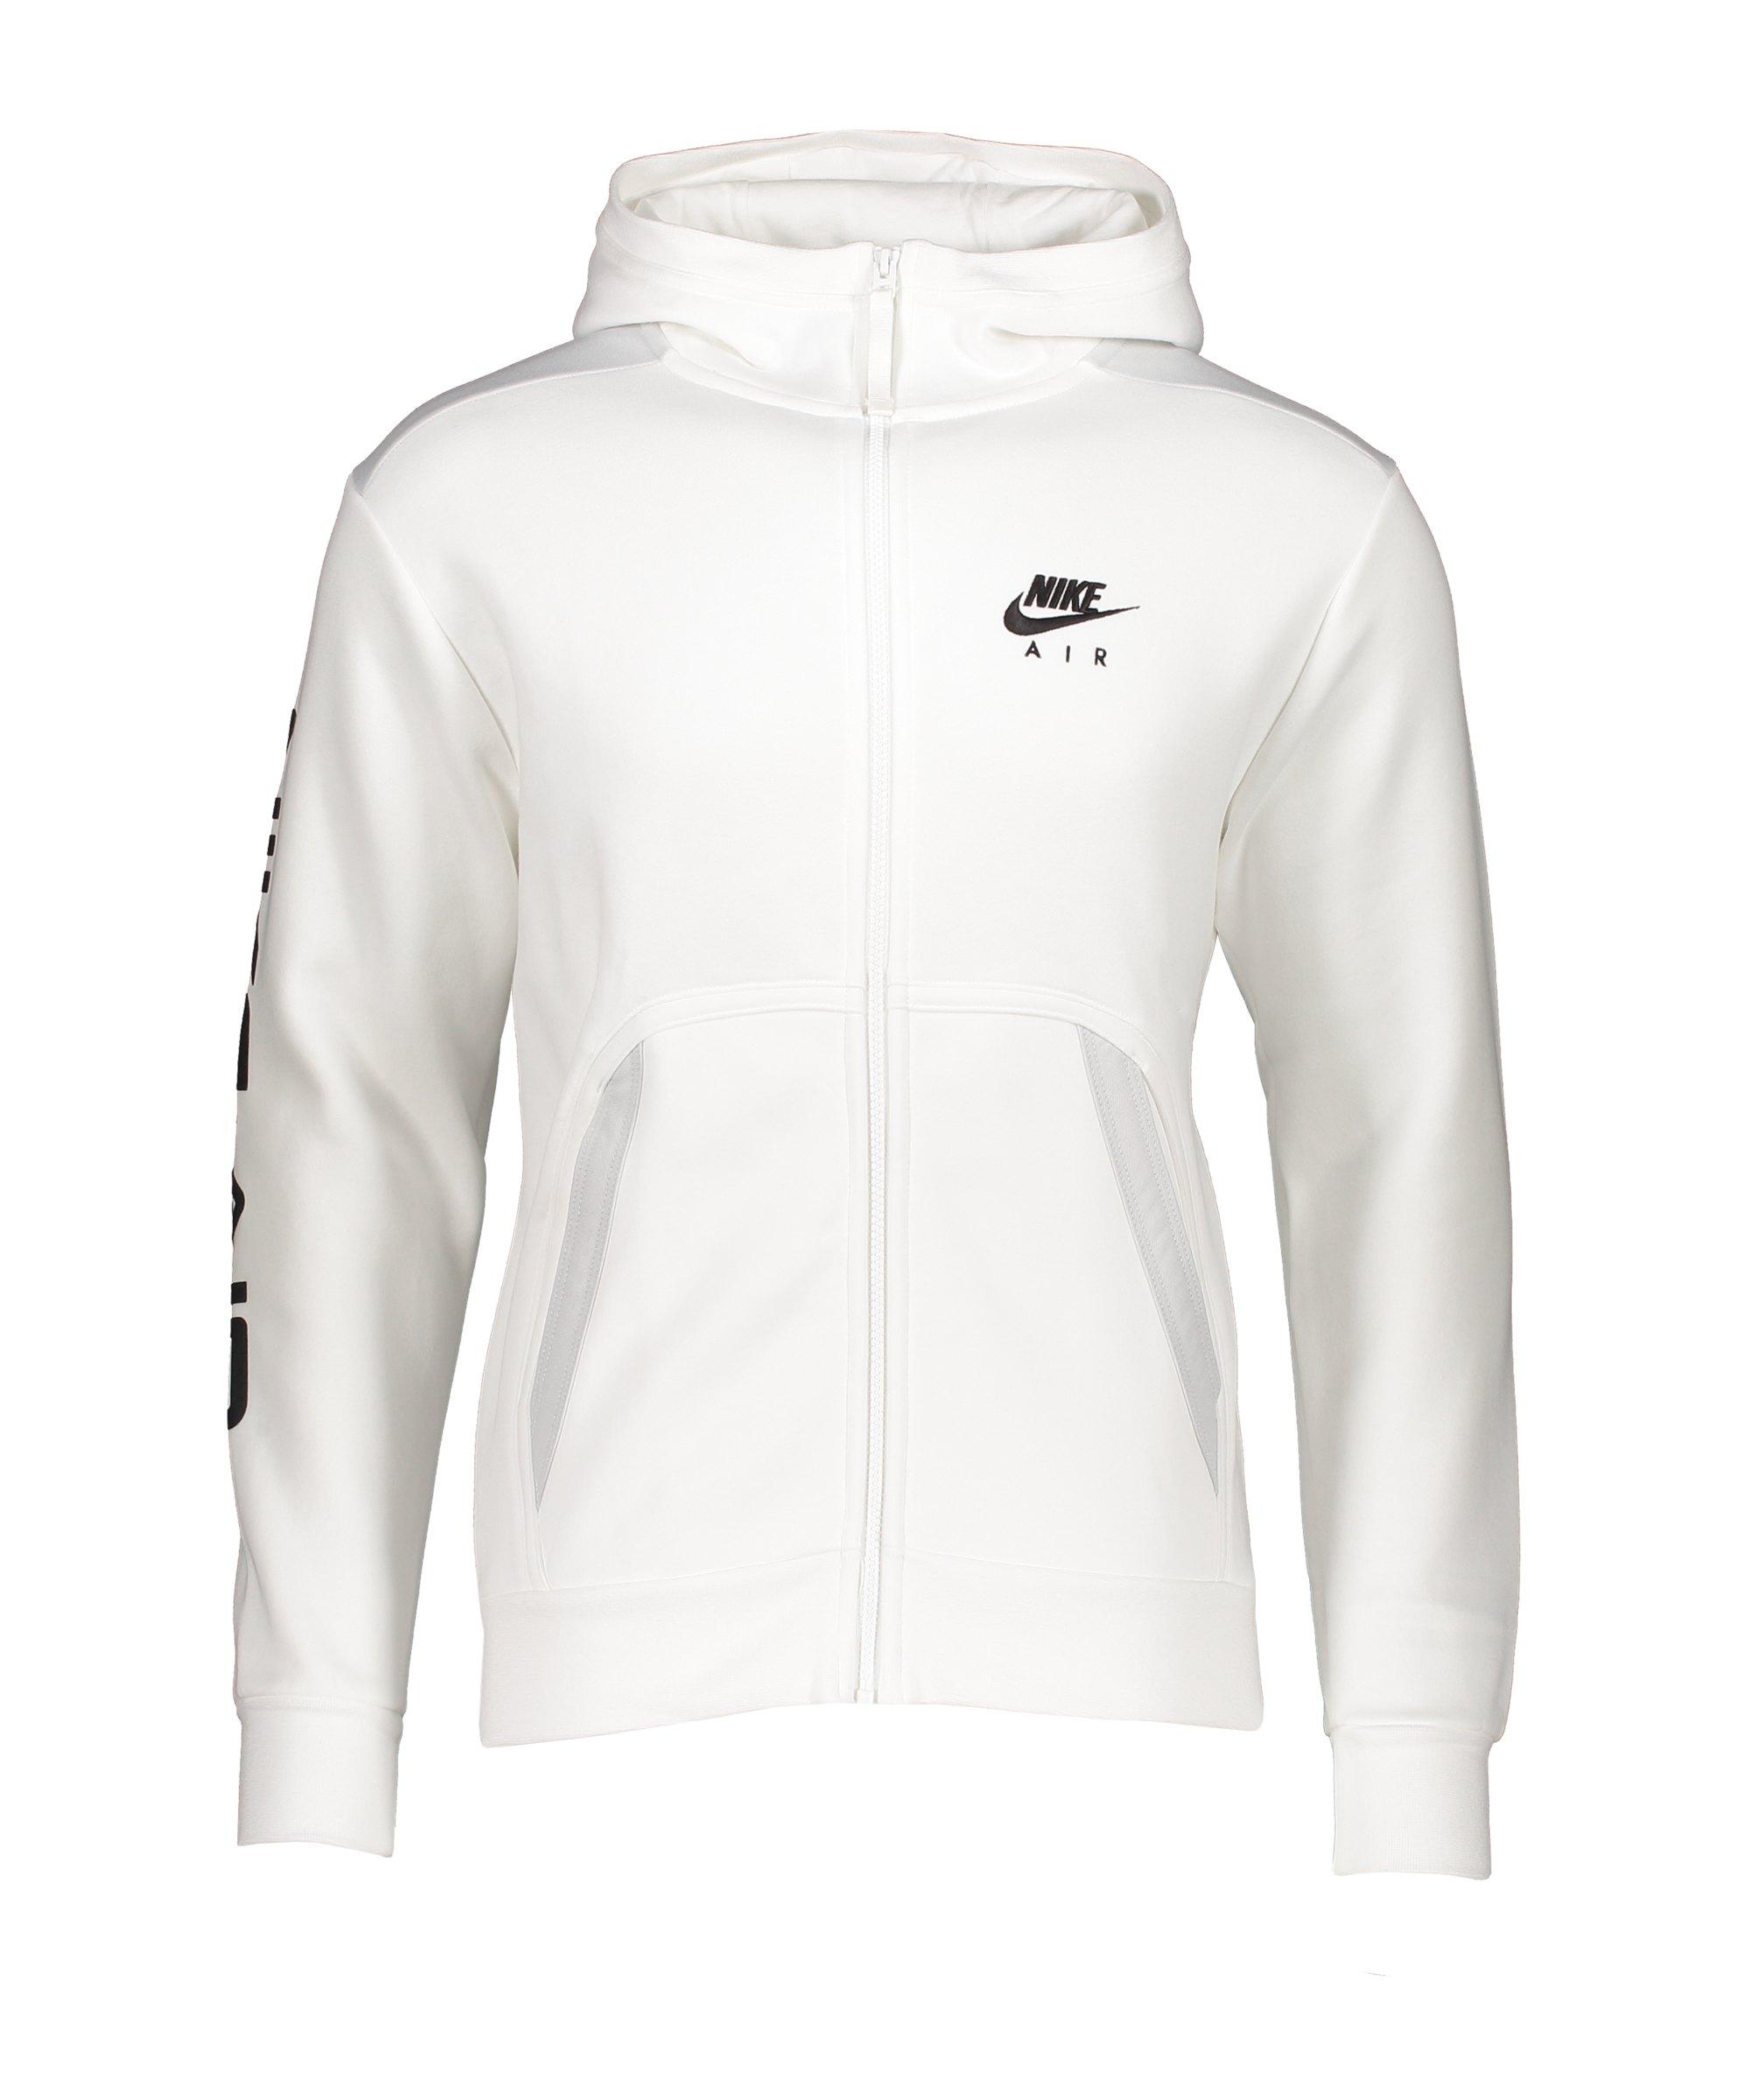 Nike Air Fleece Kapuzenjacke Weiss F100 - weiss